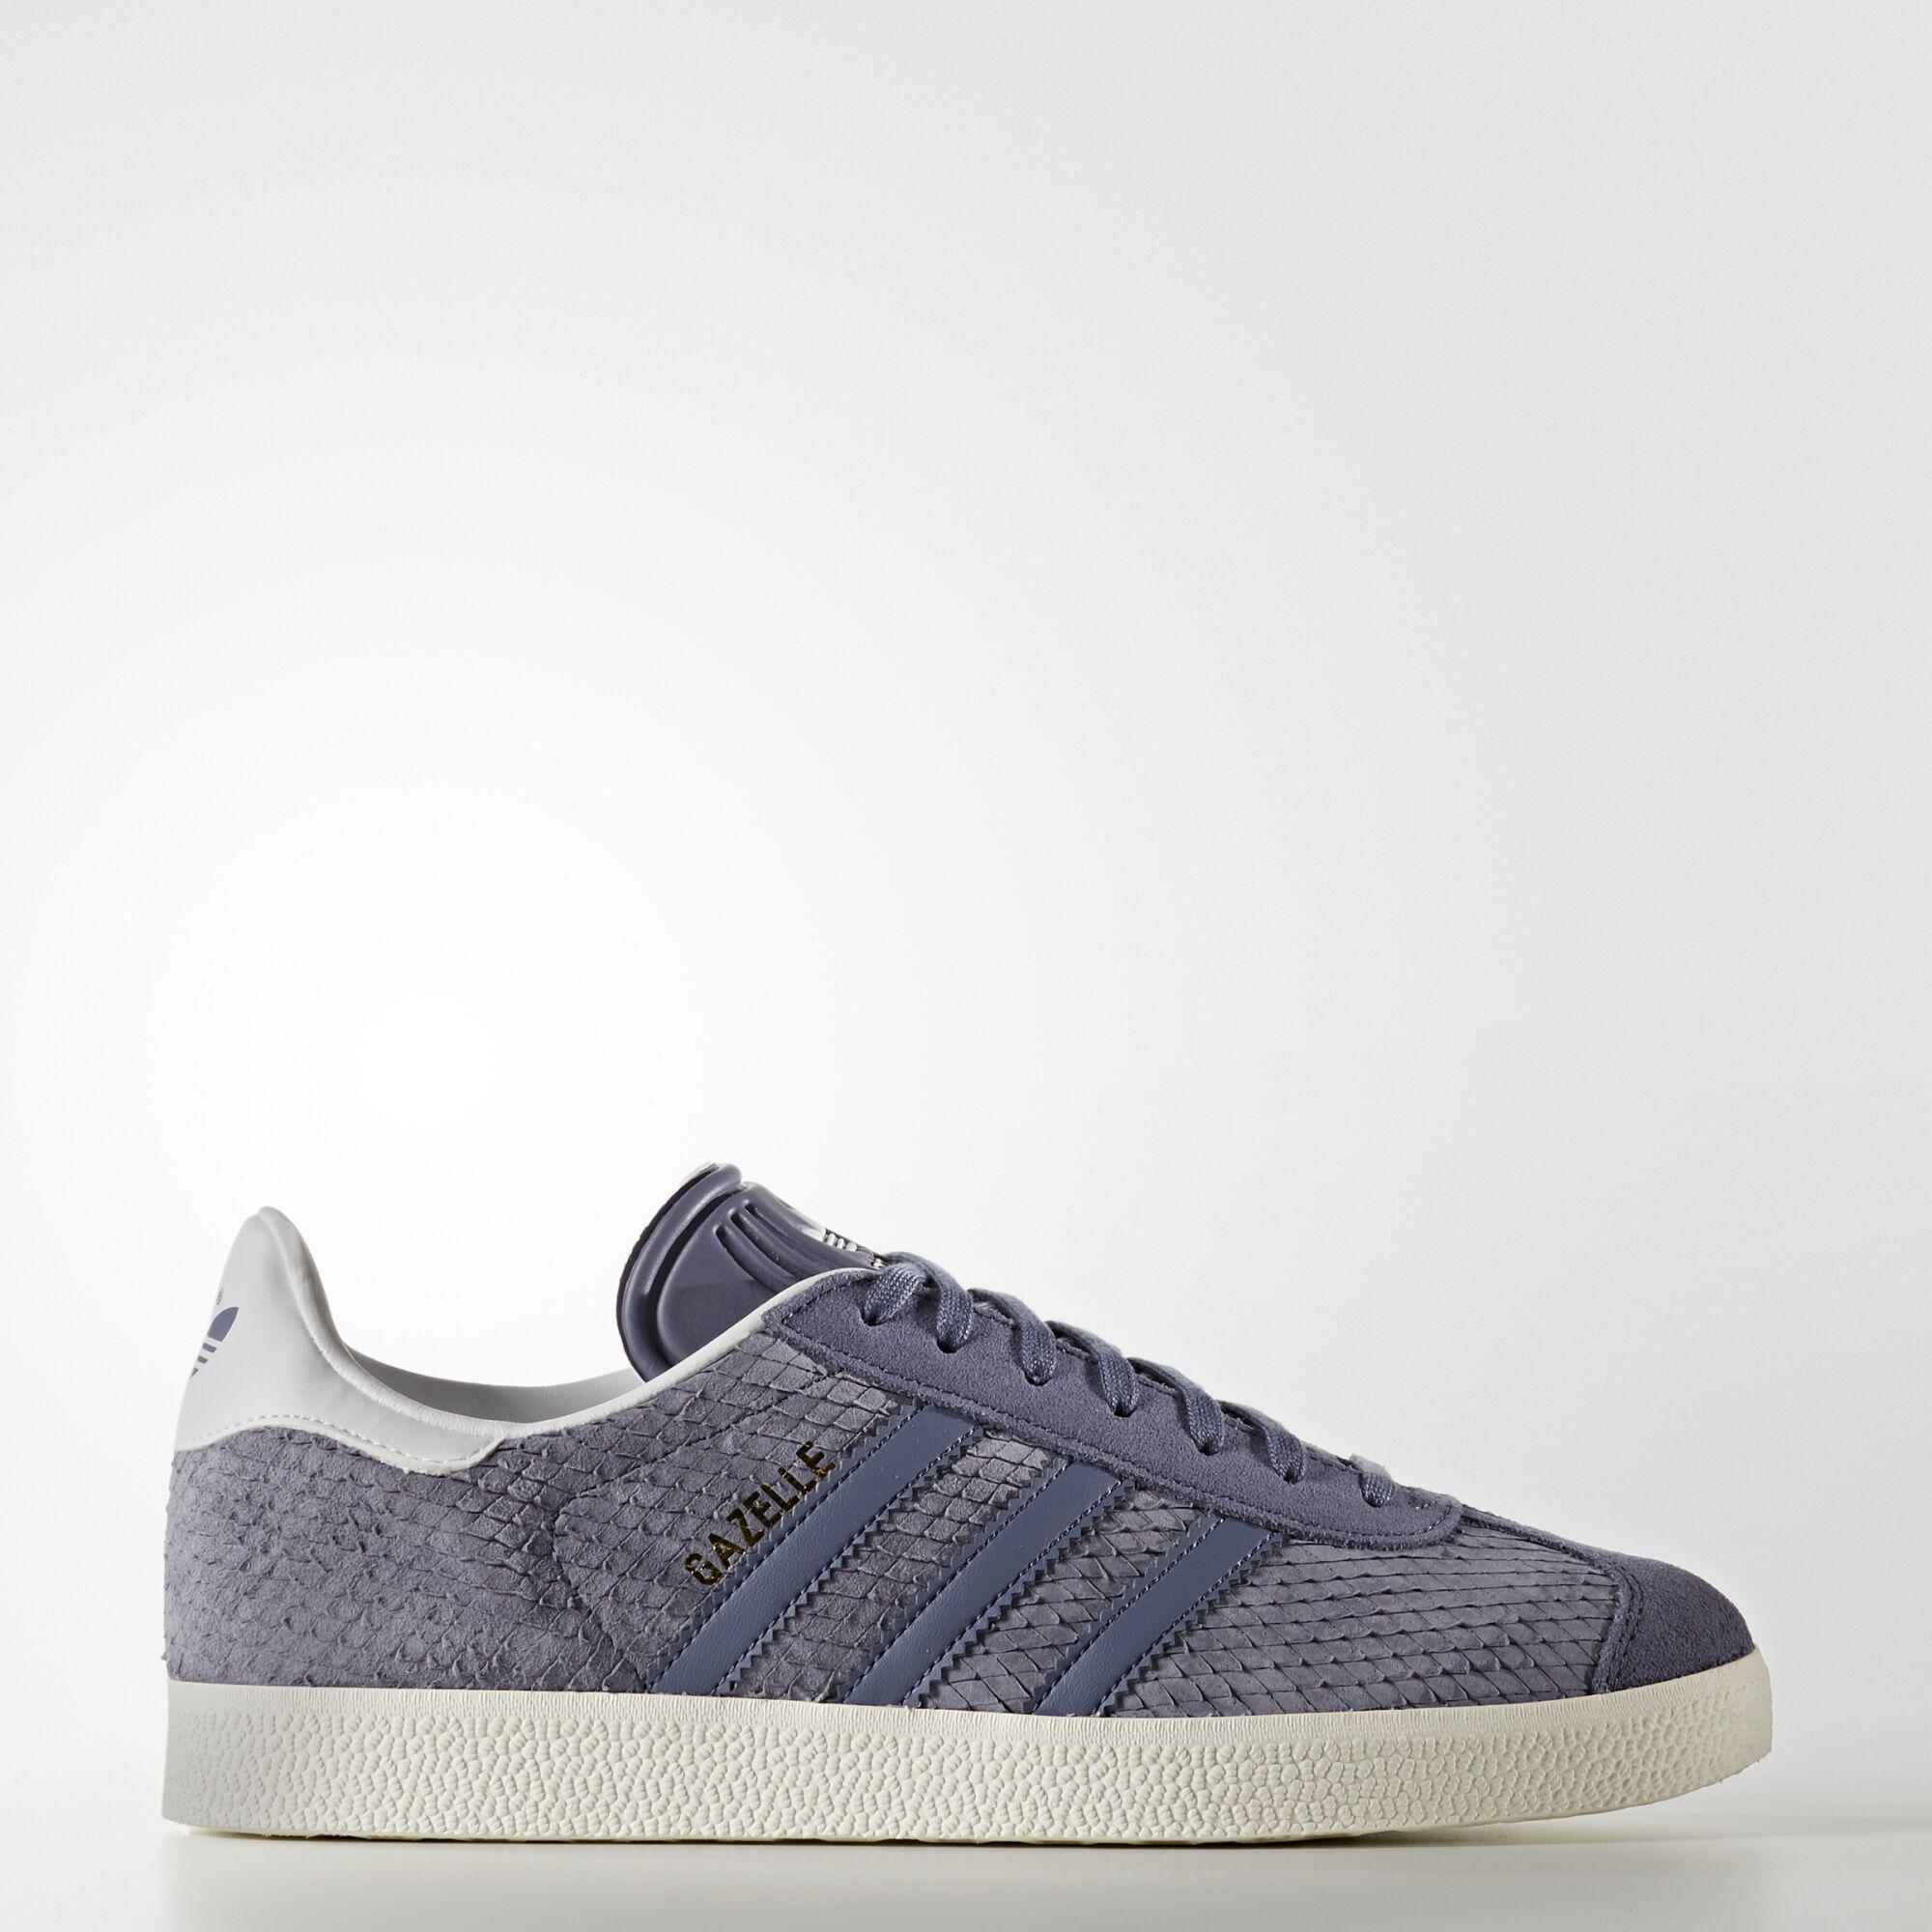 adidas gazelle all white,style adidas shoes > OFF58% Free